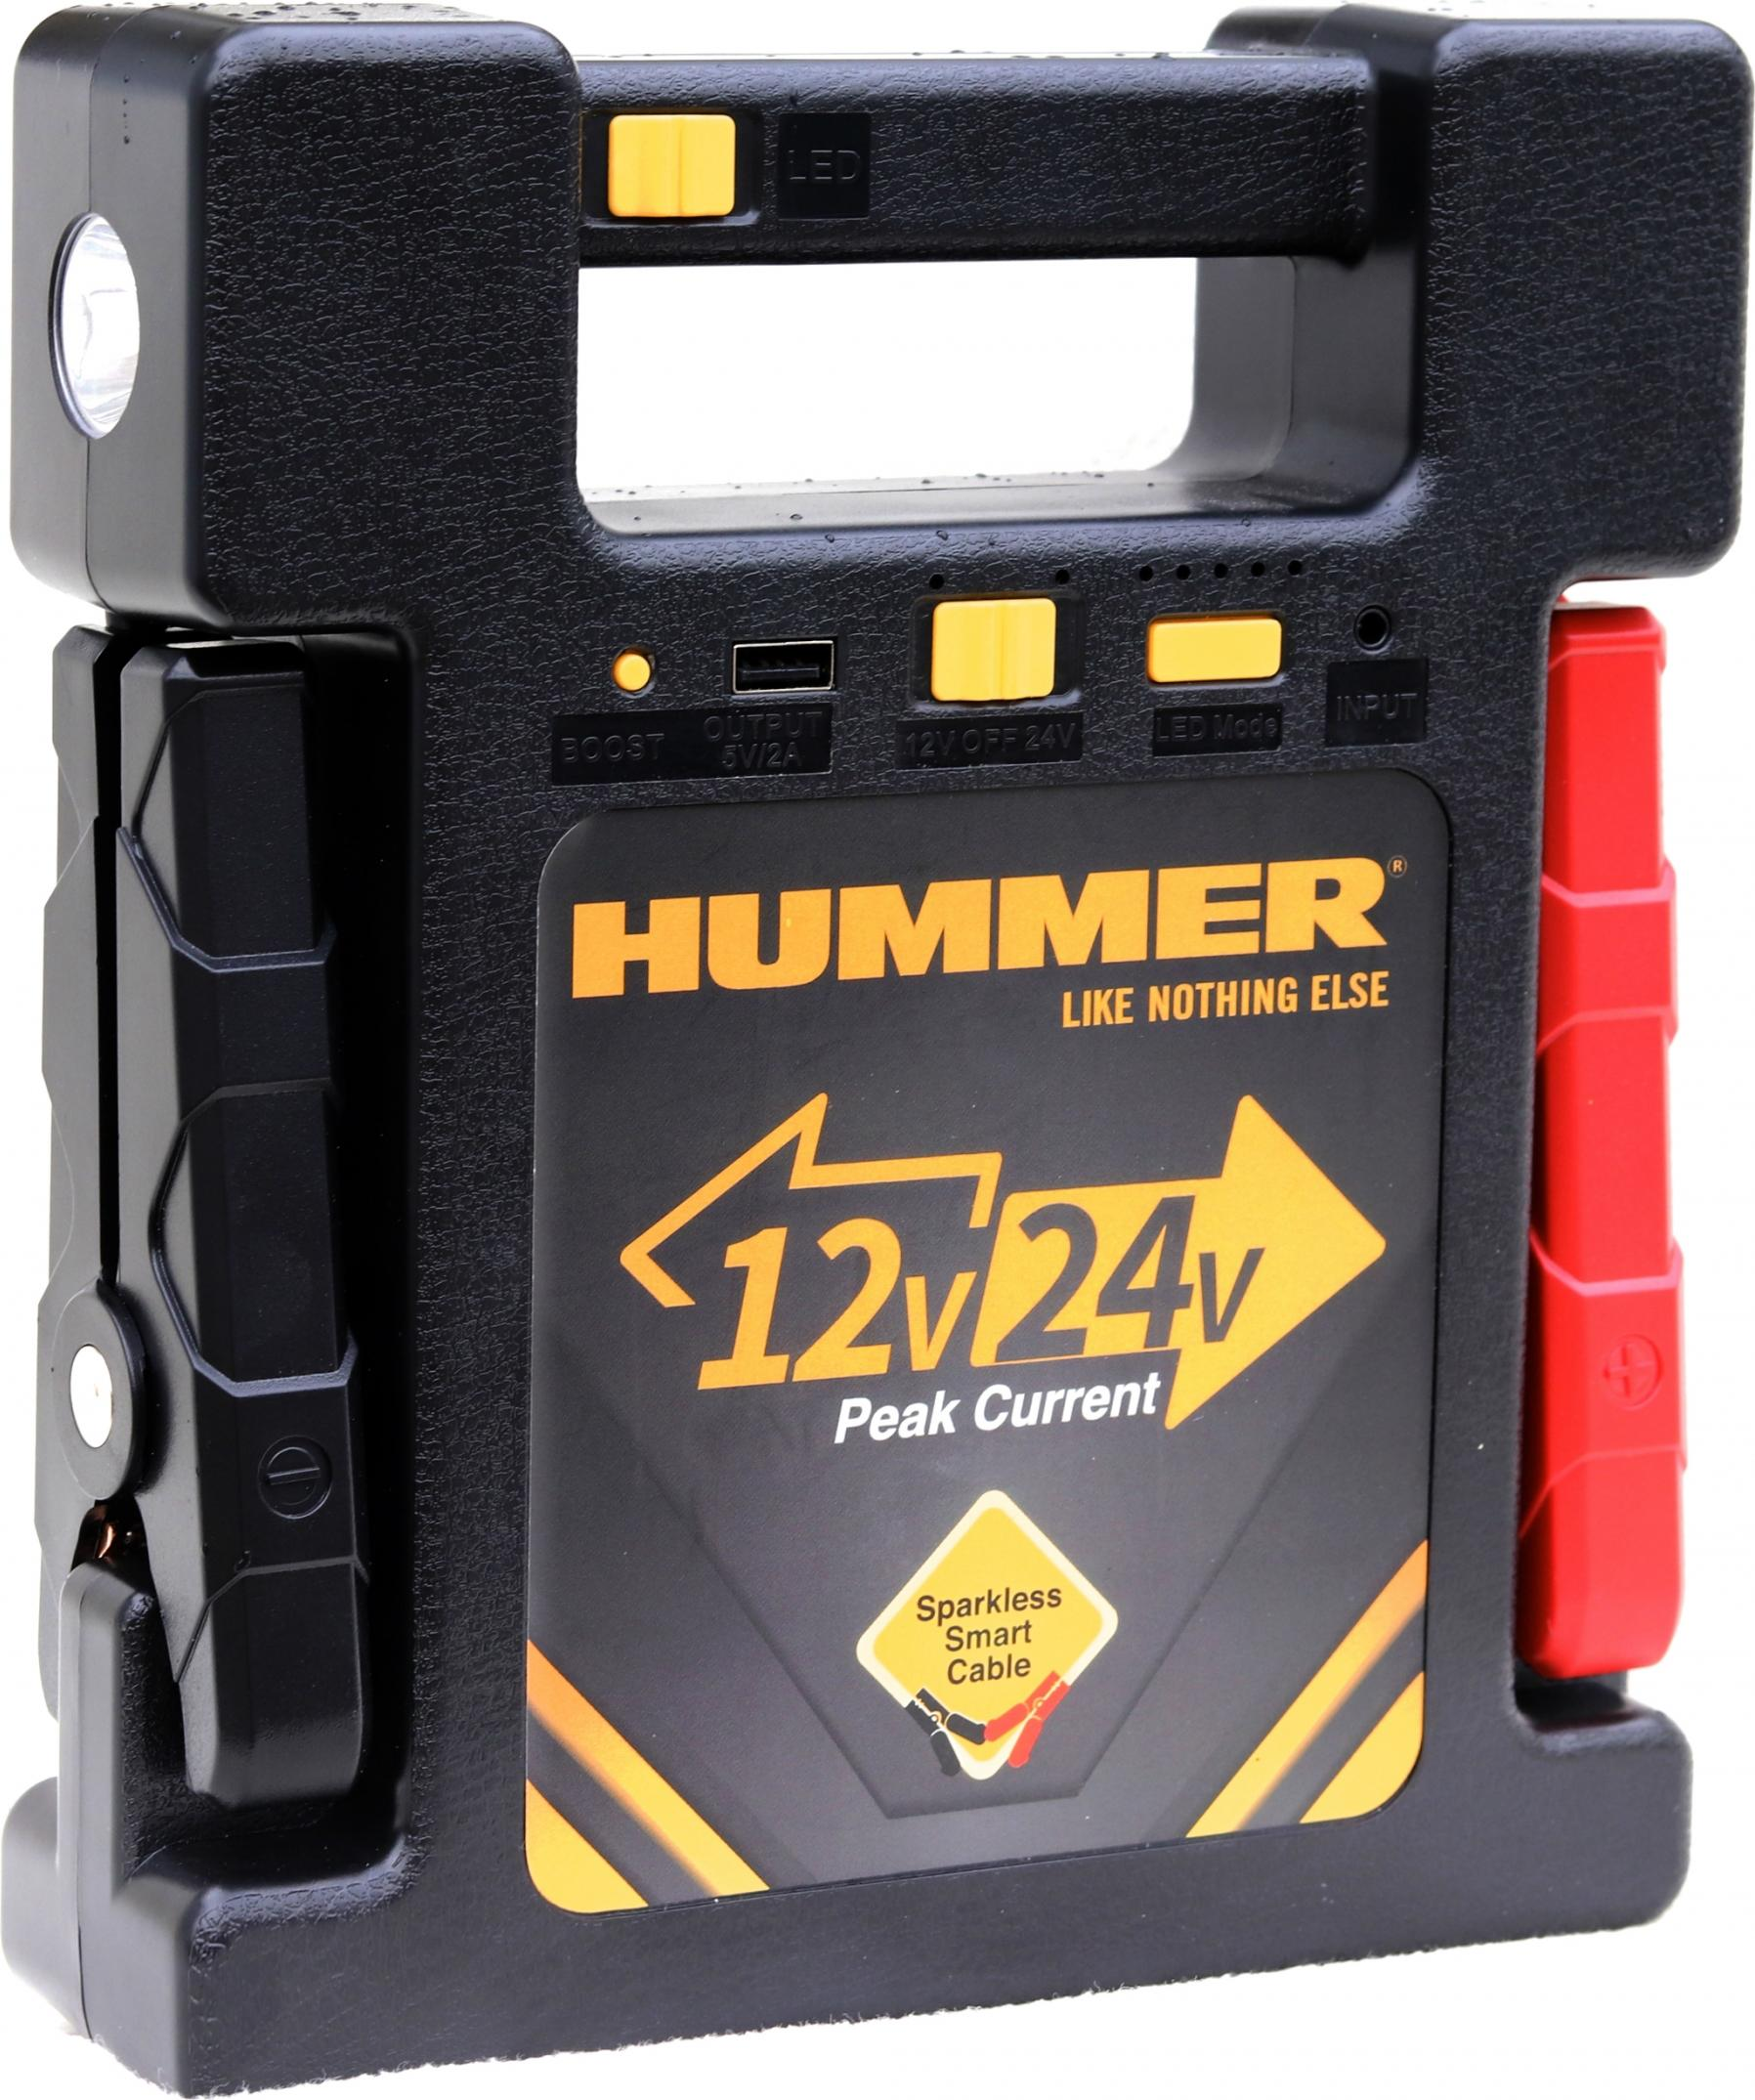 Устройство пусковое Hummer Hmr24